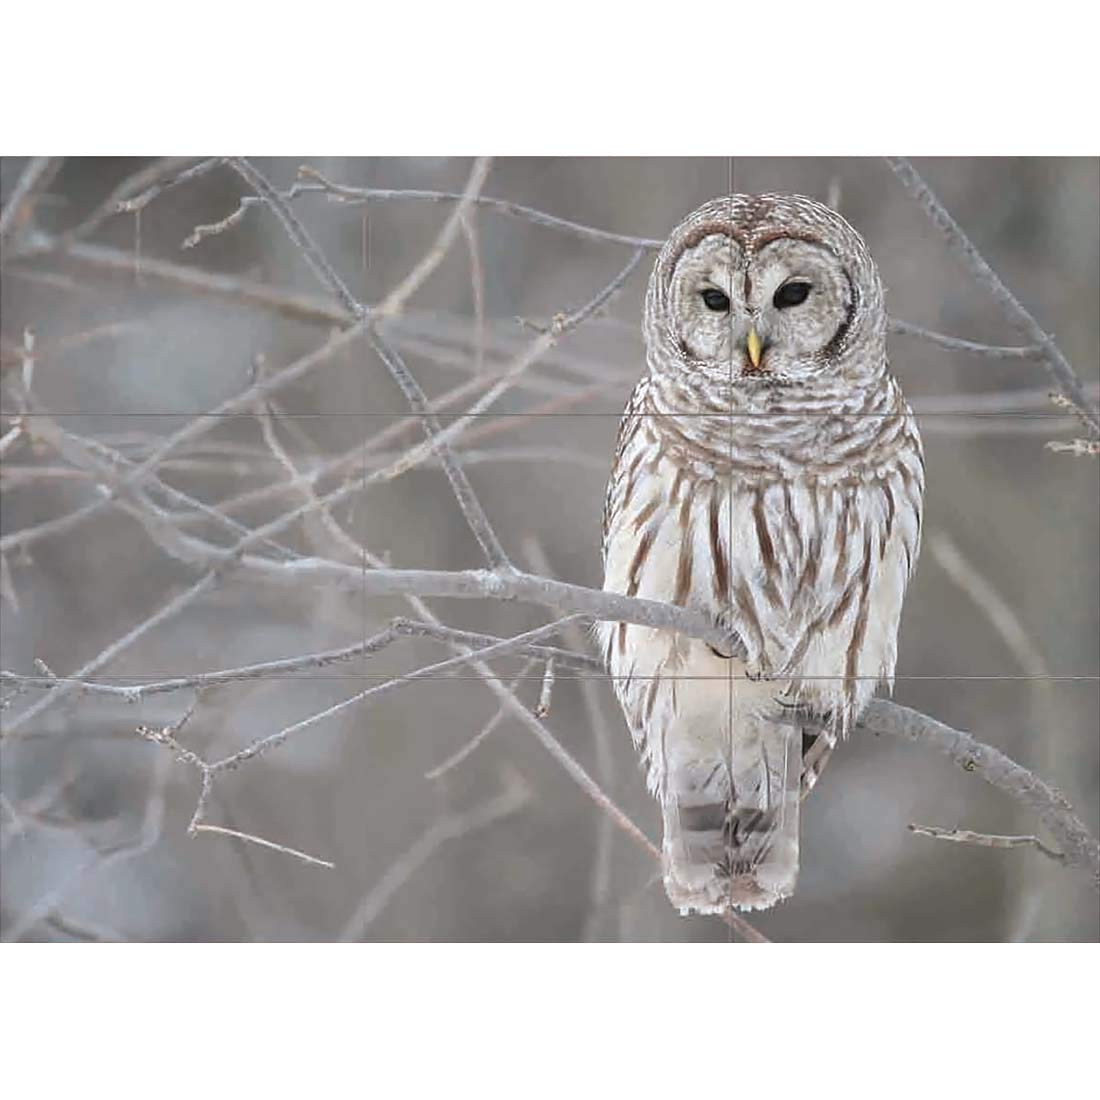 Snowy Owl Wildlife Large Wall Art Poster Print